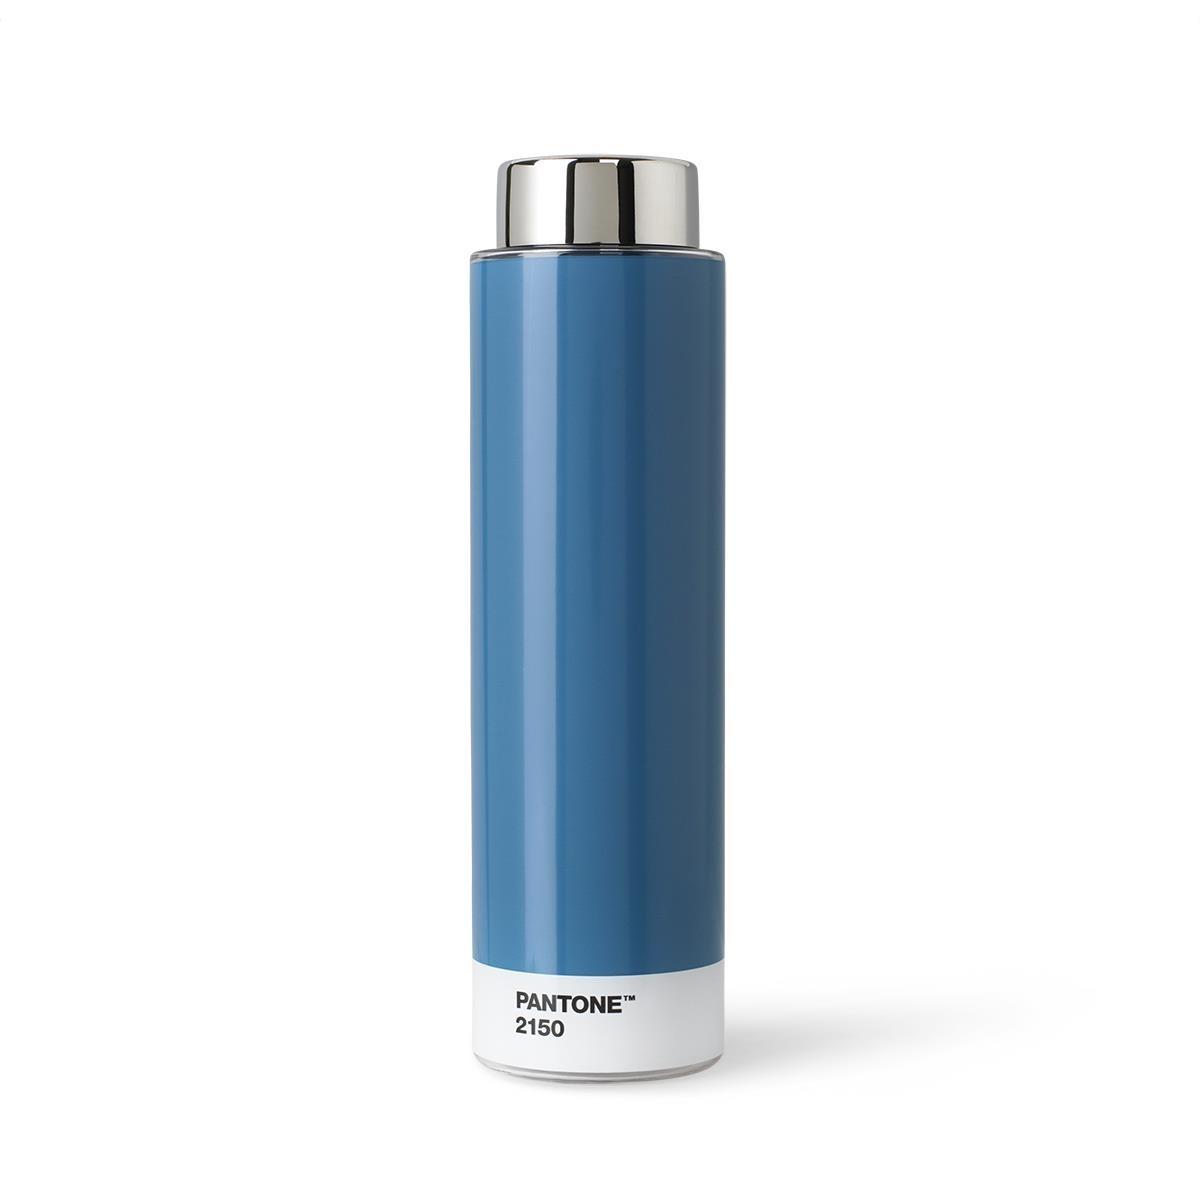 Borraccia Tritan - 500 ml - Acciaio Inossidabile - Blu 2150 - Set da 6 Pezzi